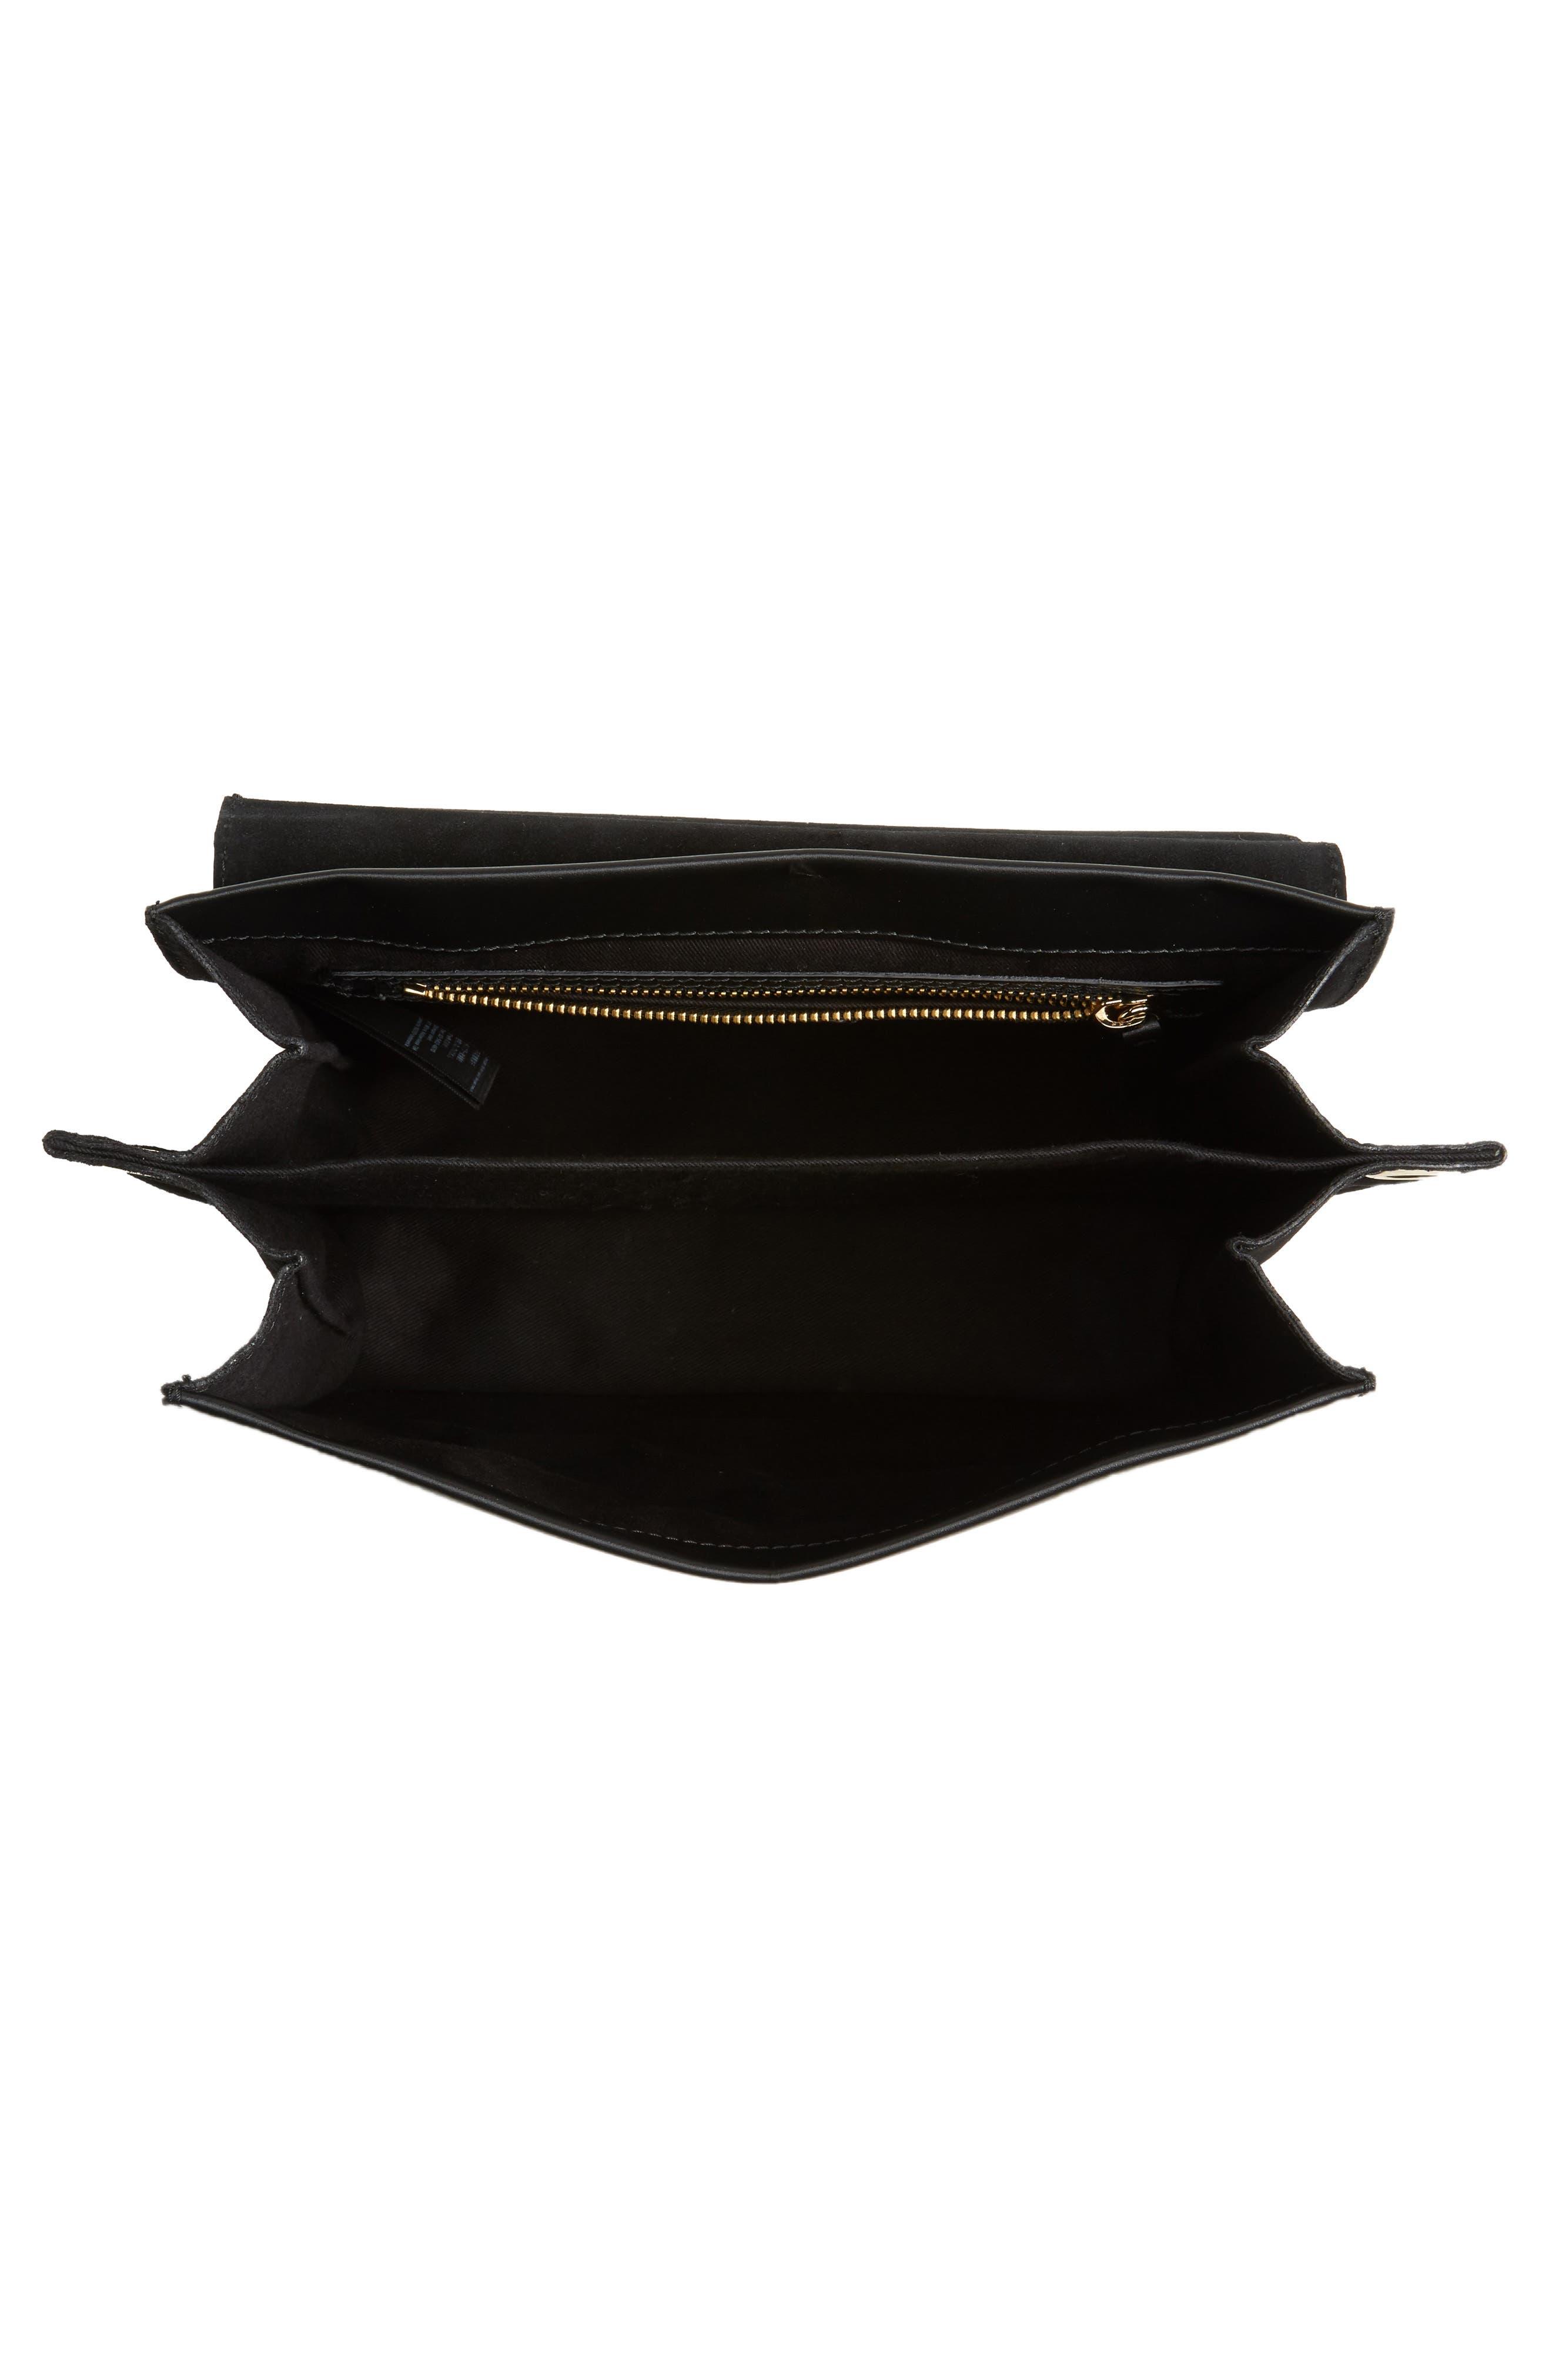 Premium Leather & Suede Soko Shoulder Bag,                             Alternate thumbnail 5, color,                             Black